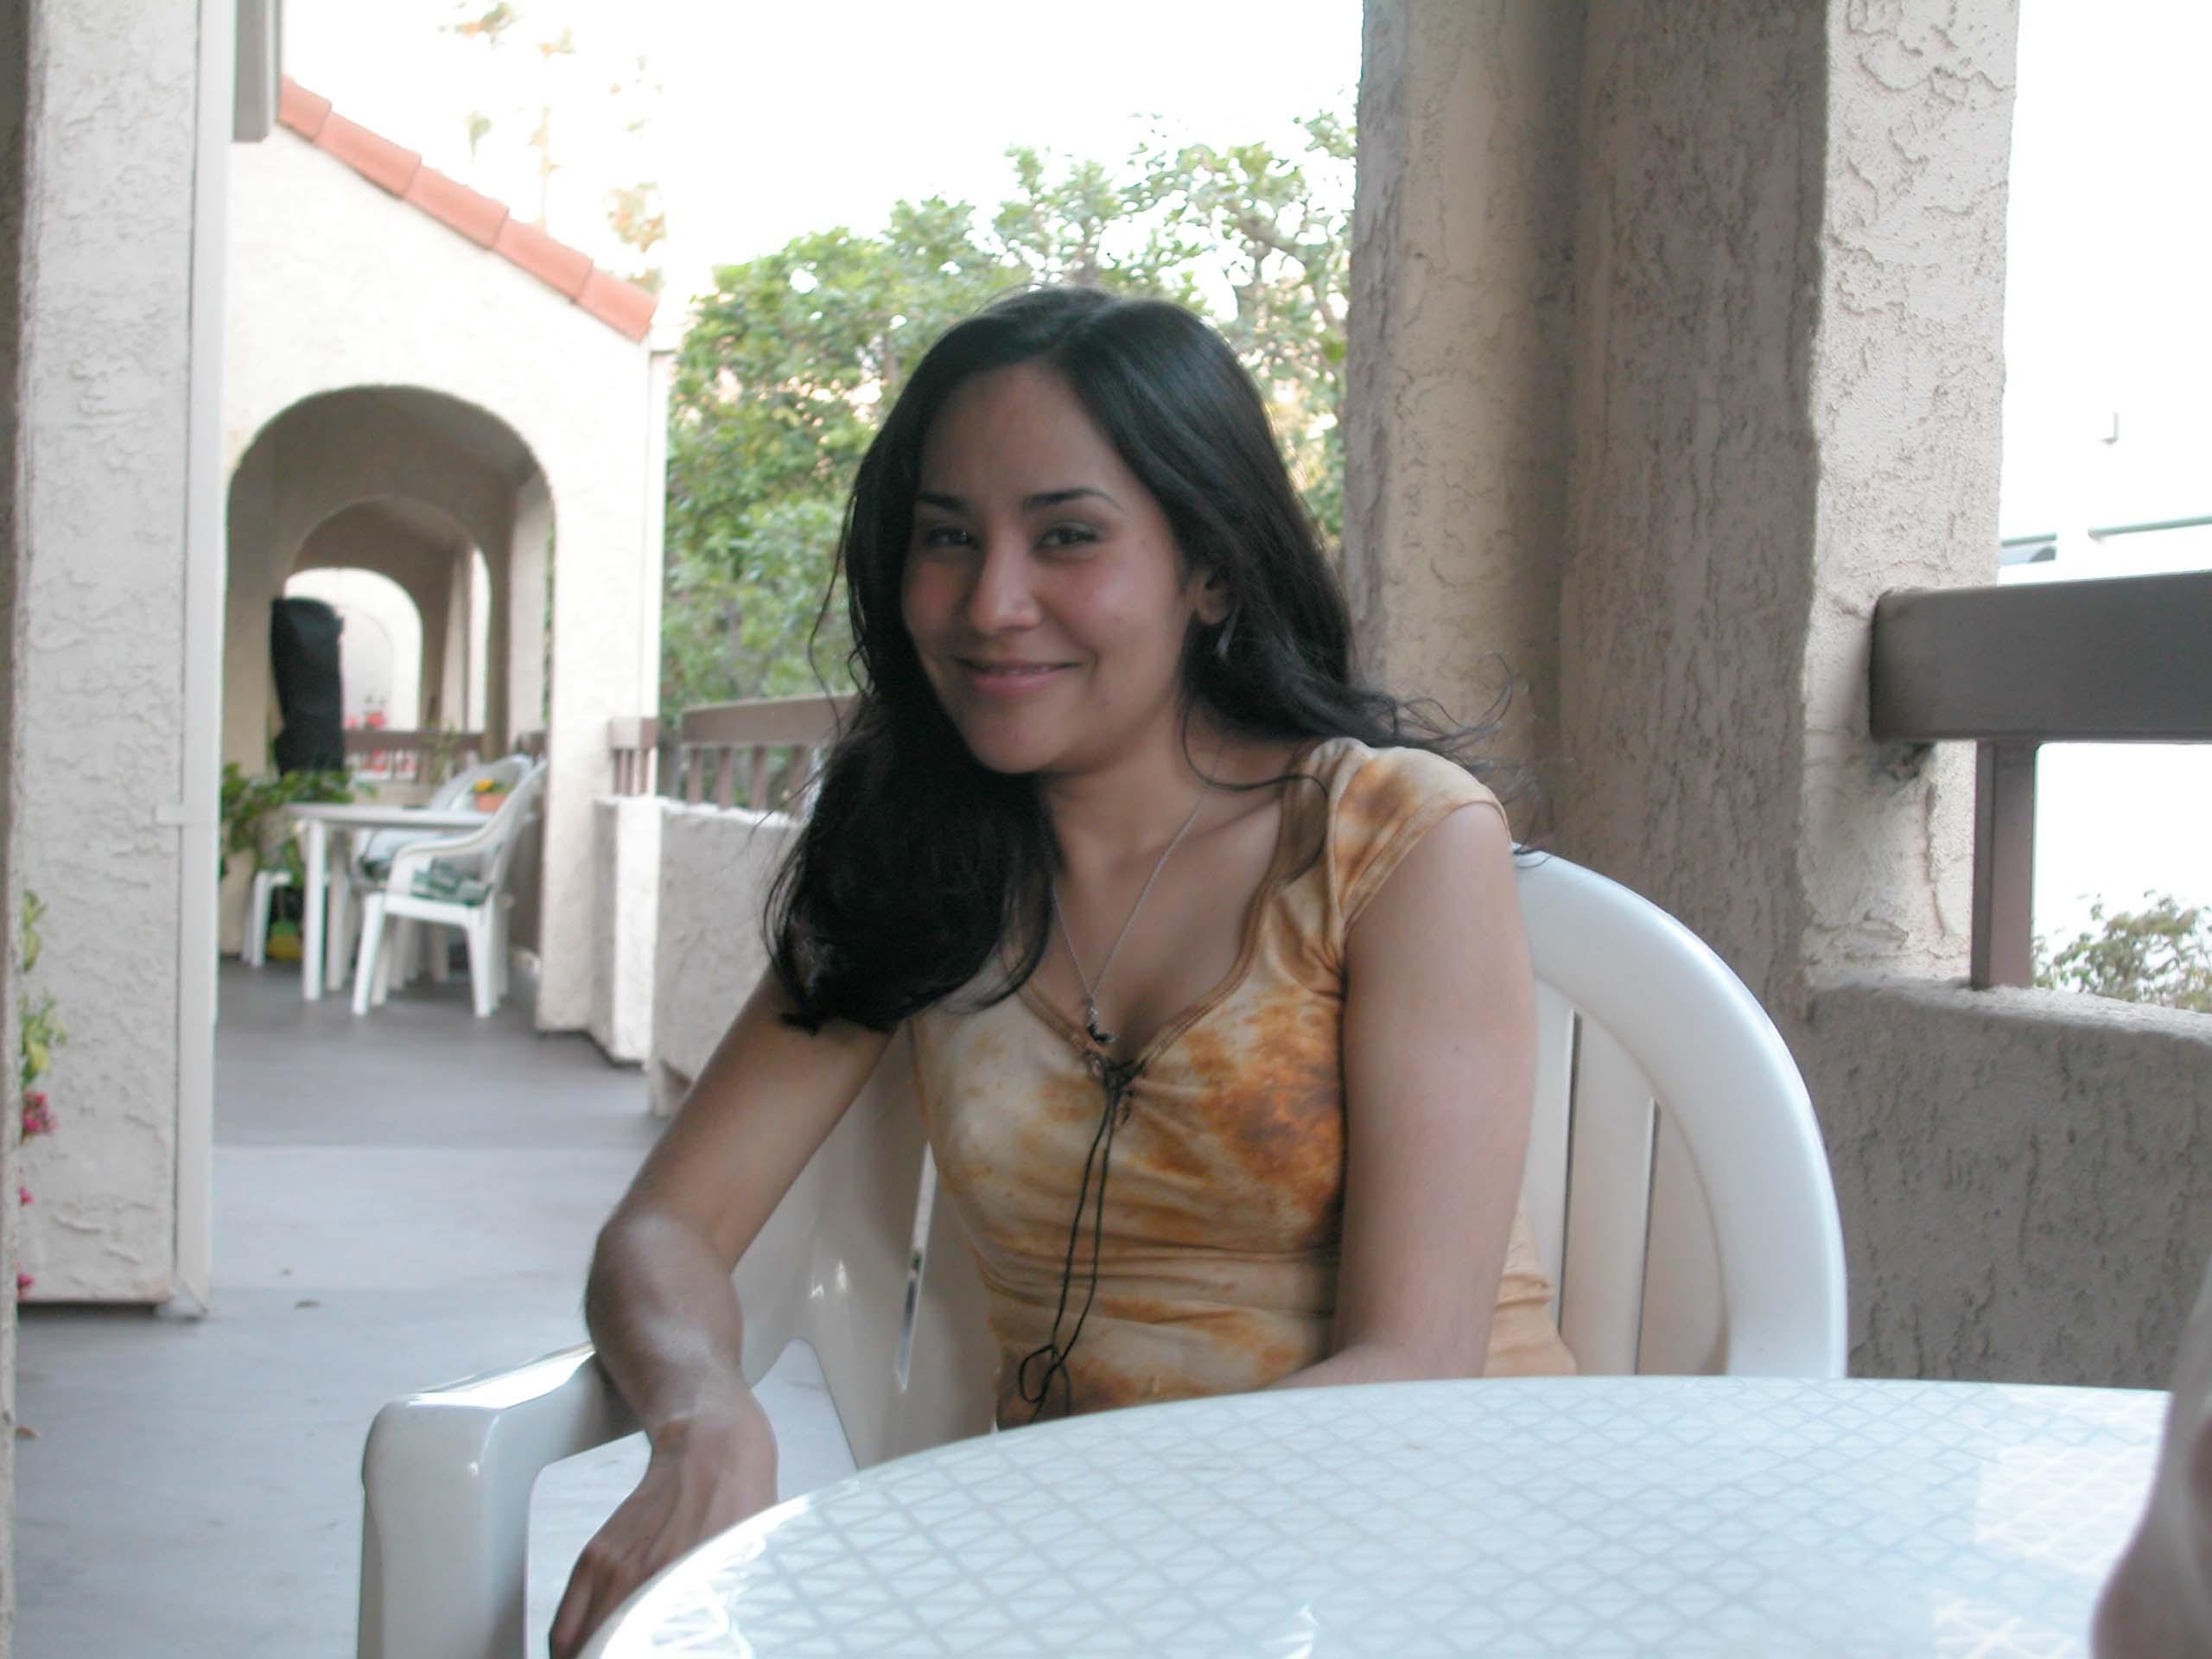 Adrianna Olivarez